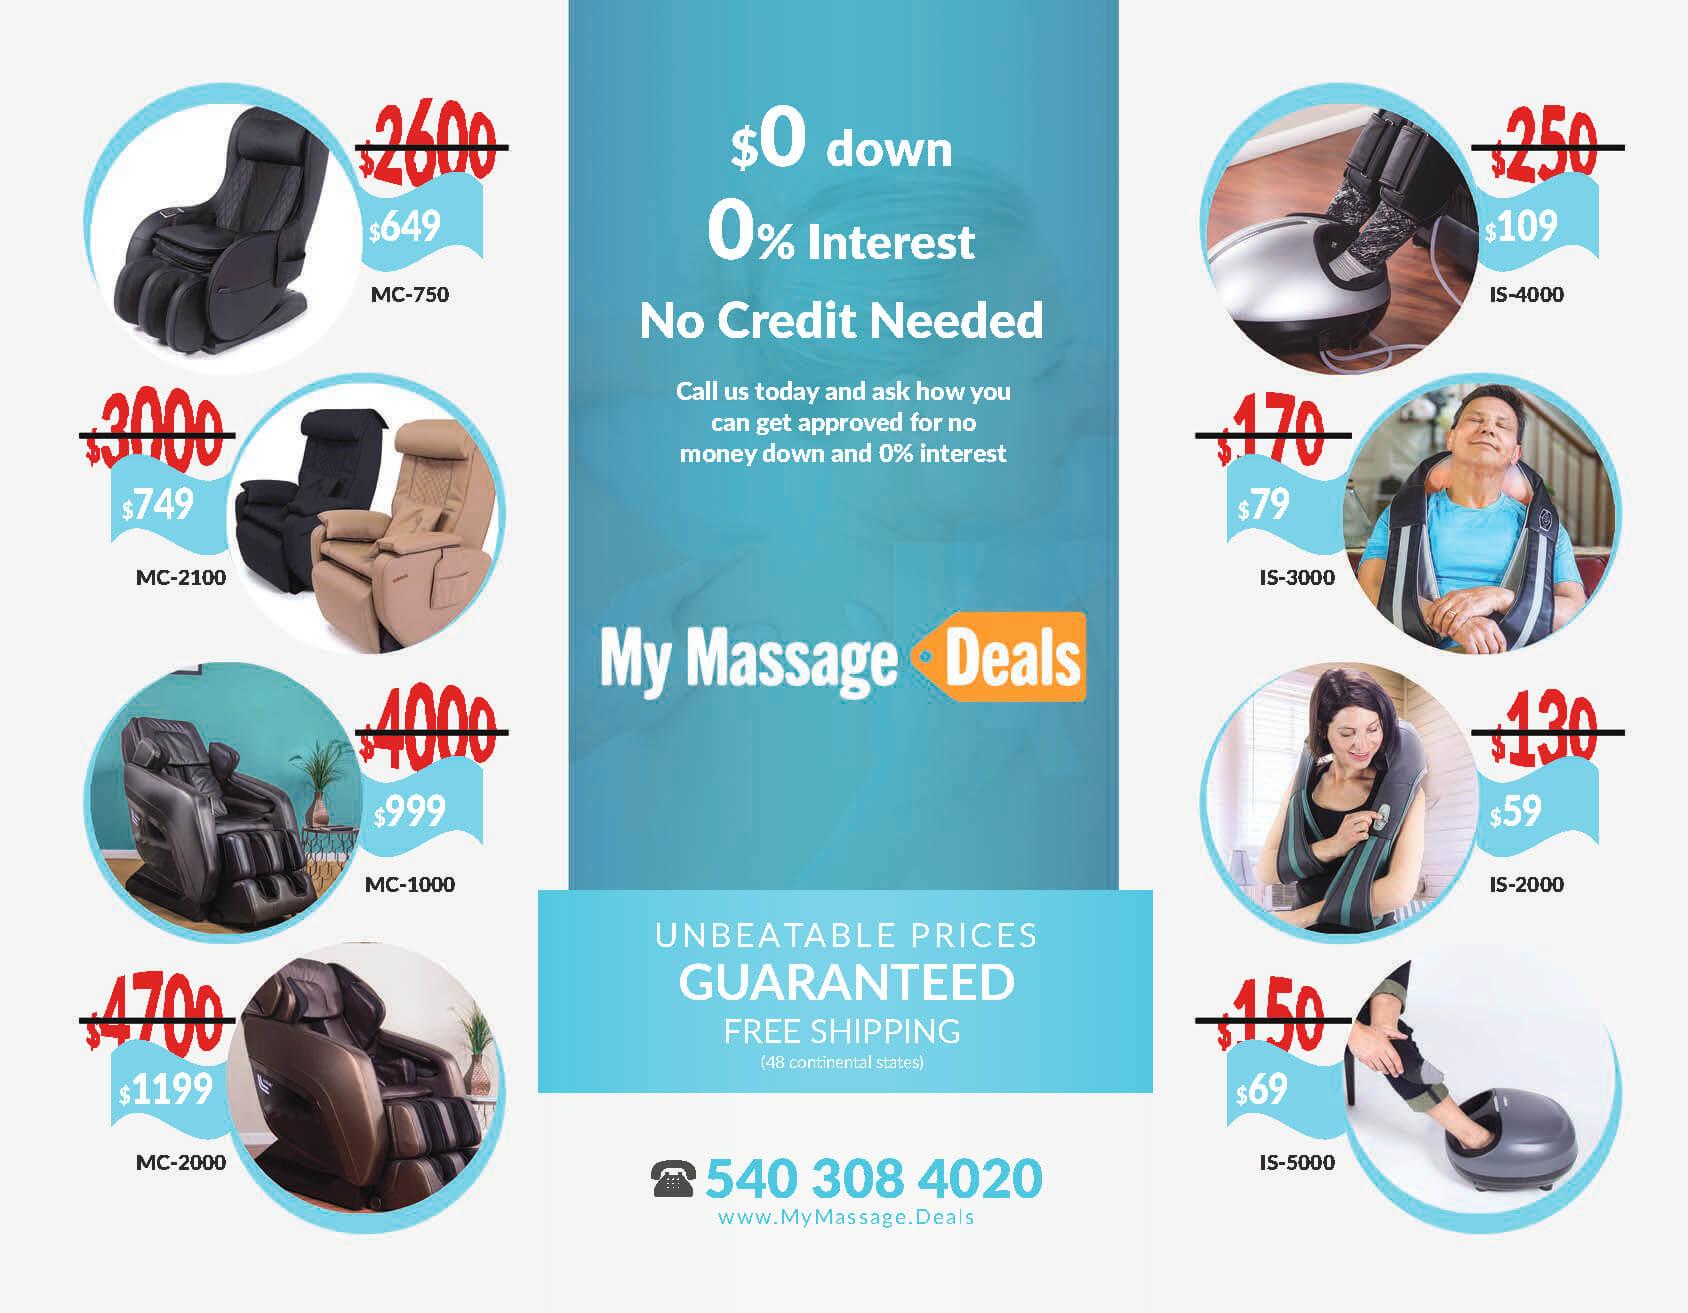 My Massage Deals - TriFold Brochure Layout Design - Full Inside